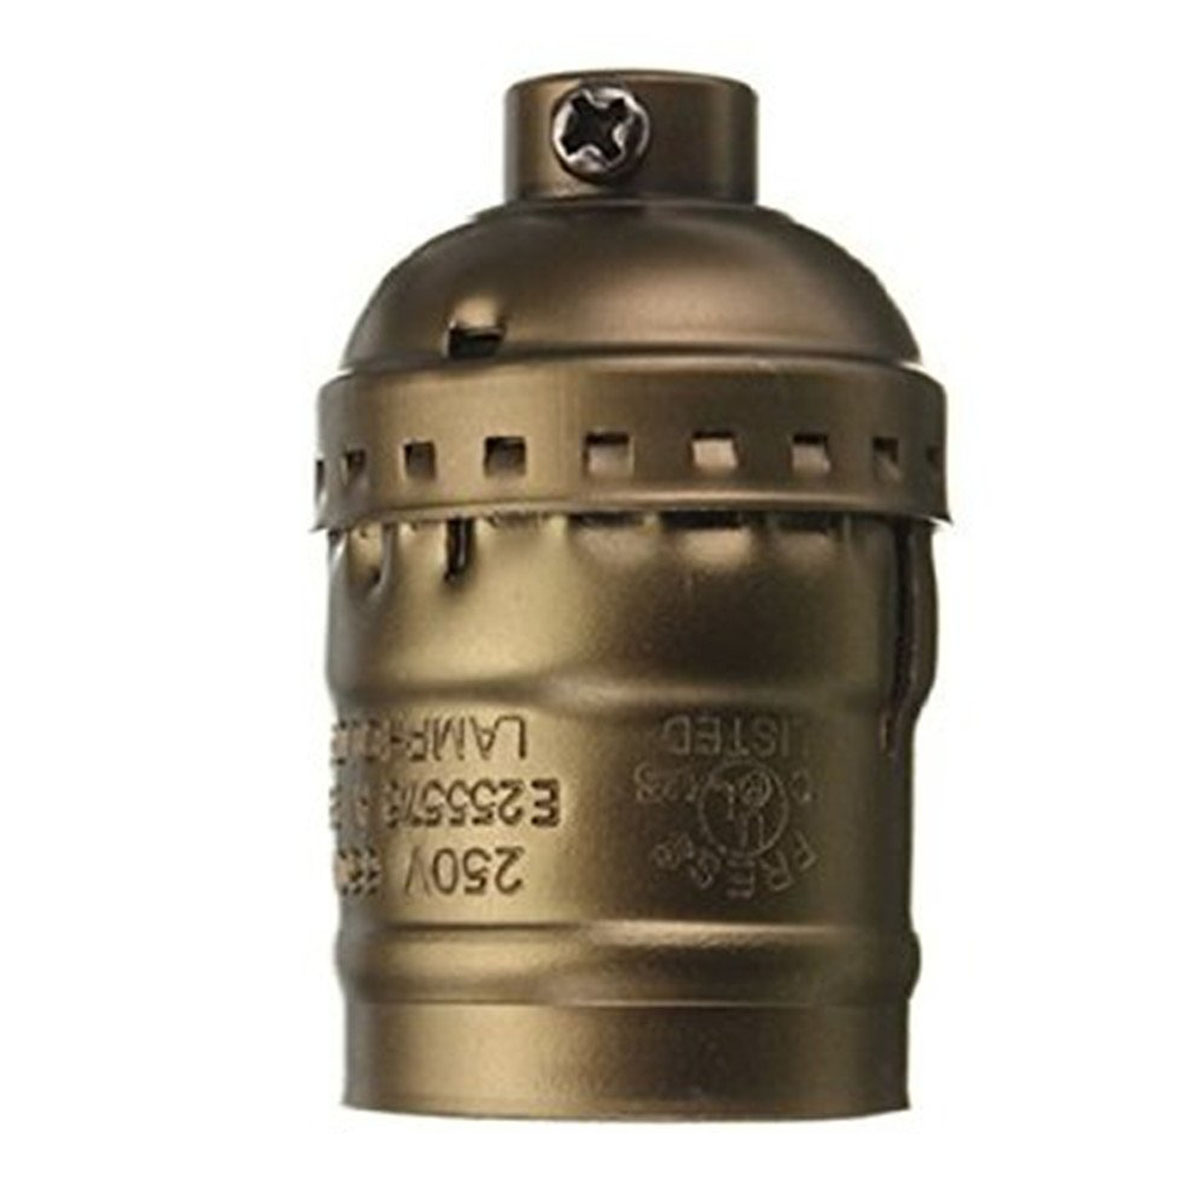 Edison Vintage Lamp Light Base socket Holder adapter E27 Bulbs -Suitable fo G2F7